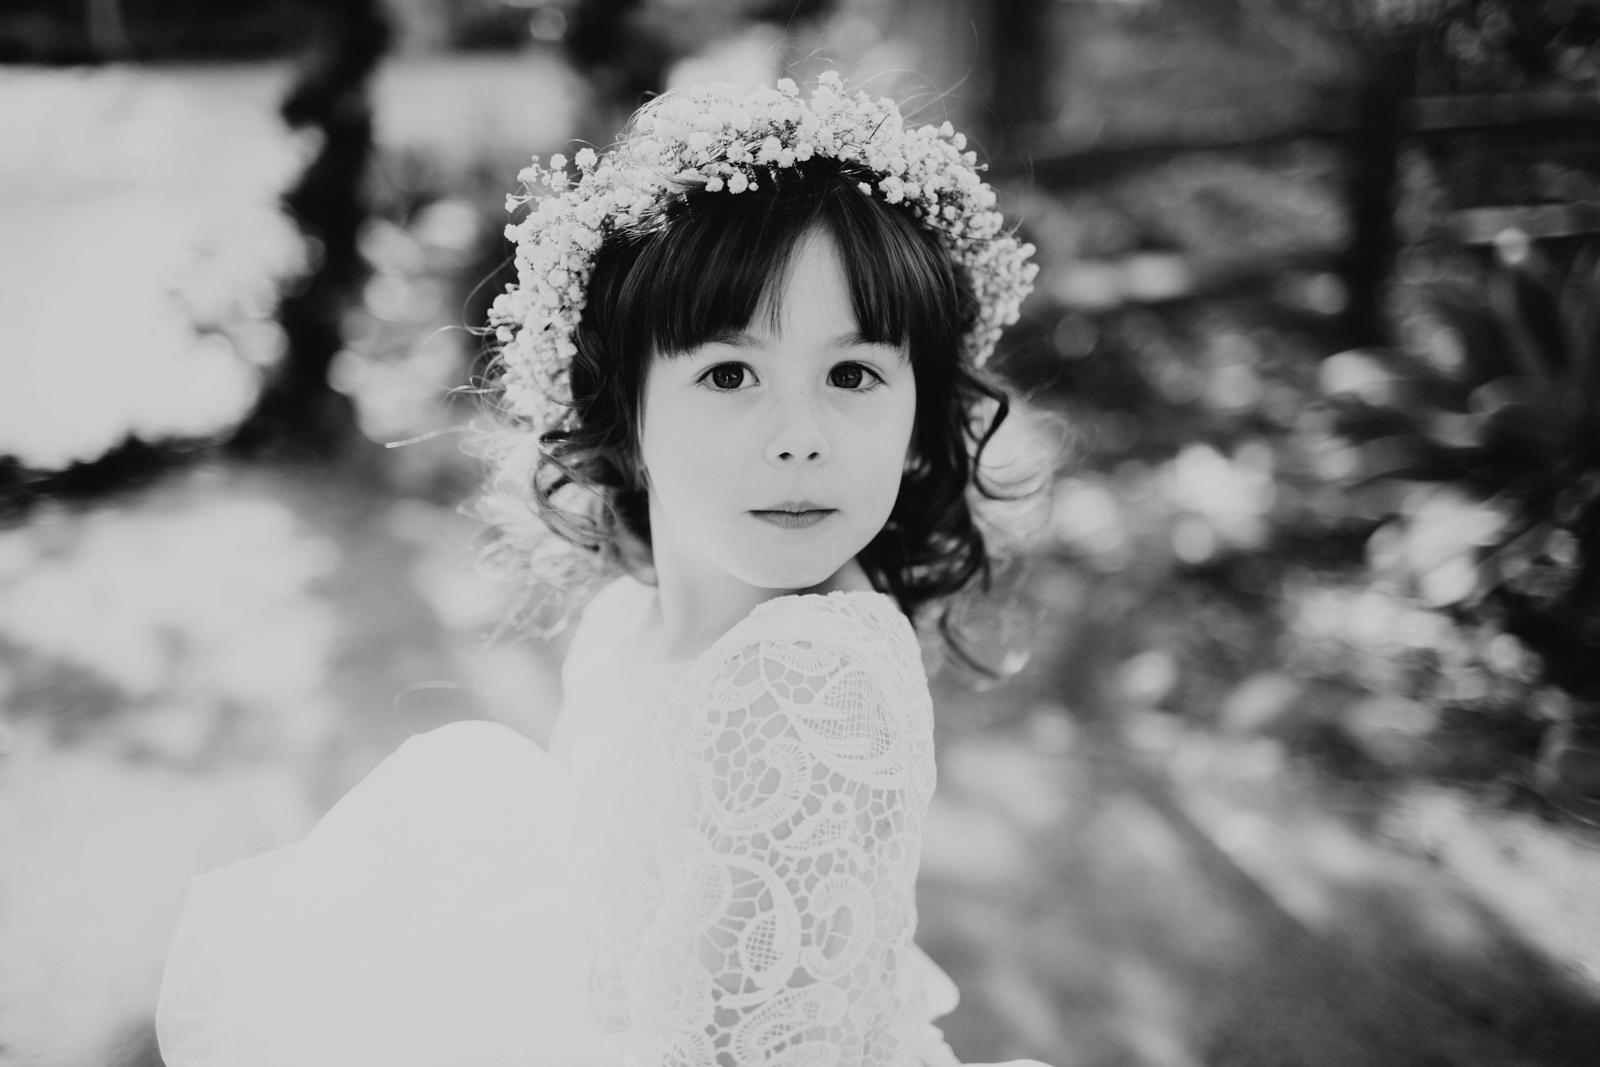 PaulSimonPhotography-JessicaJosh-SanJuanCapistranoWedding-57.jpg